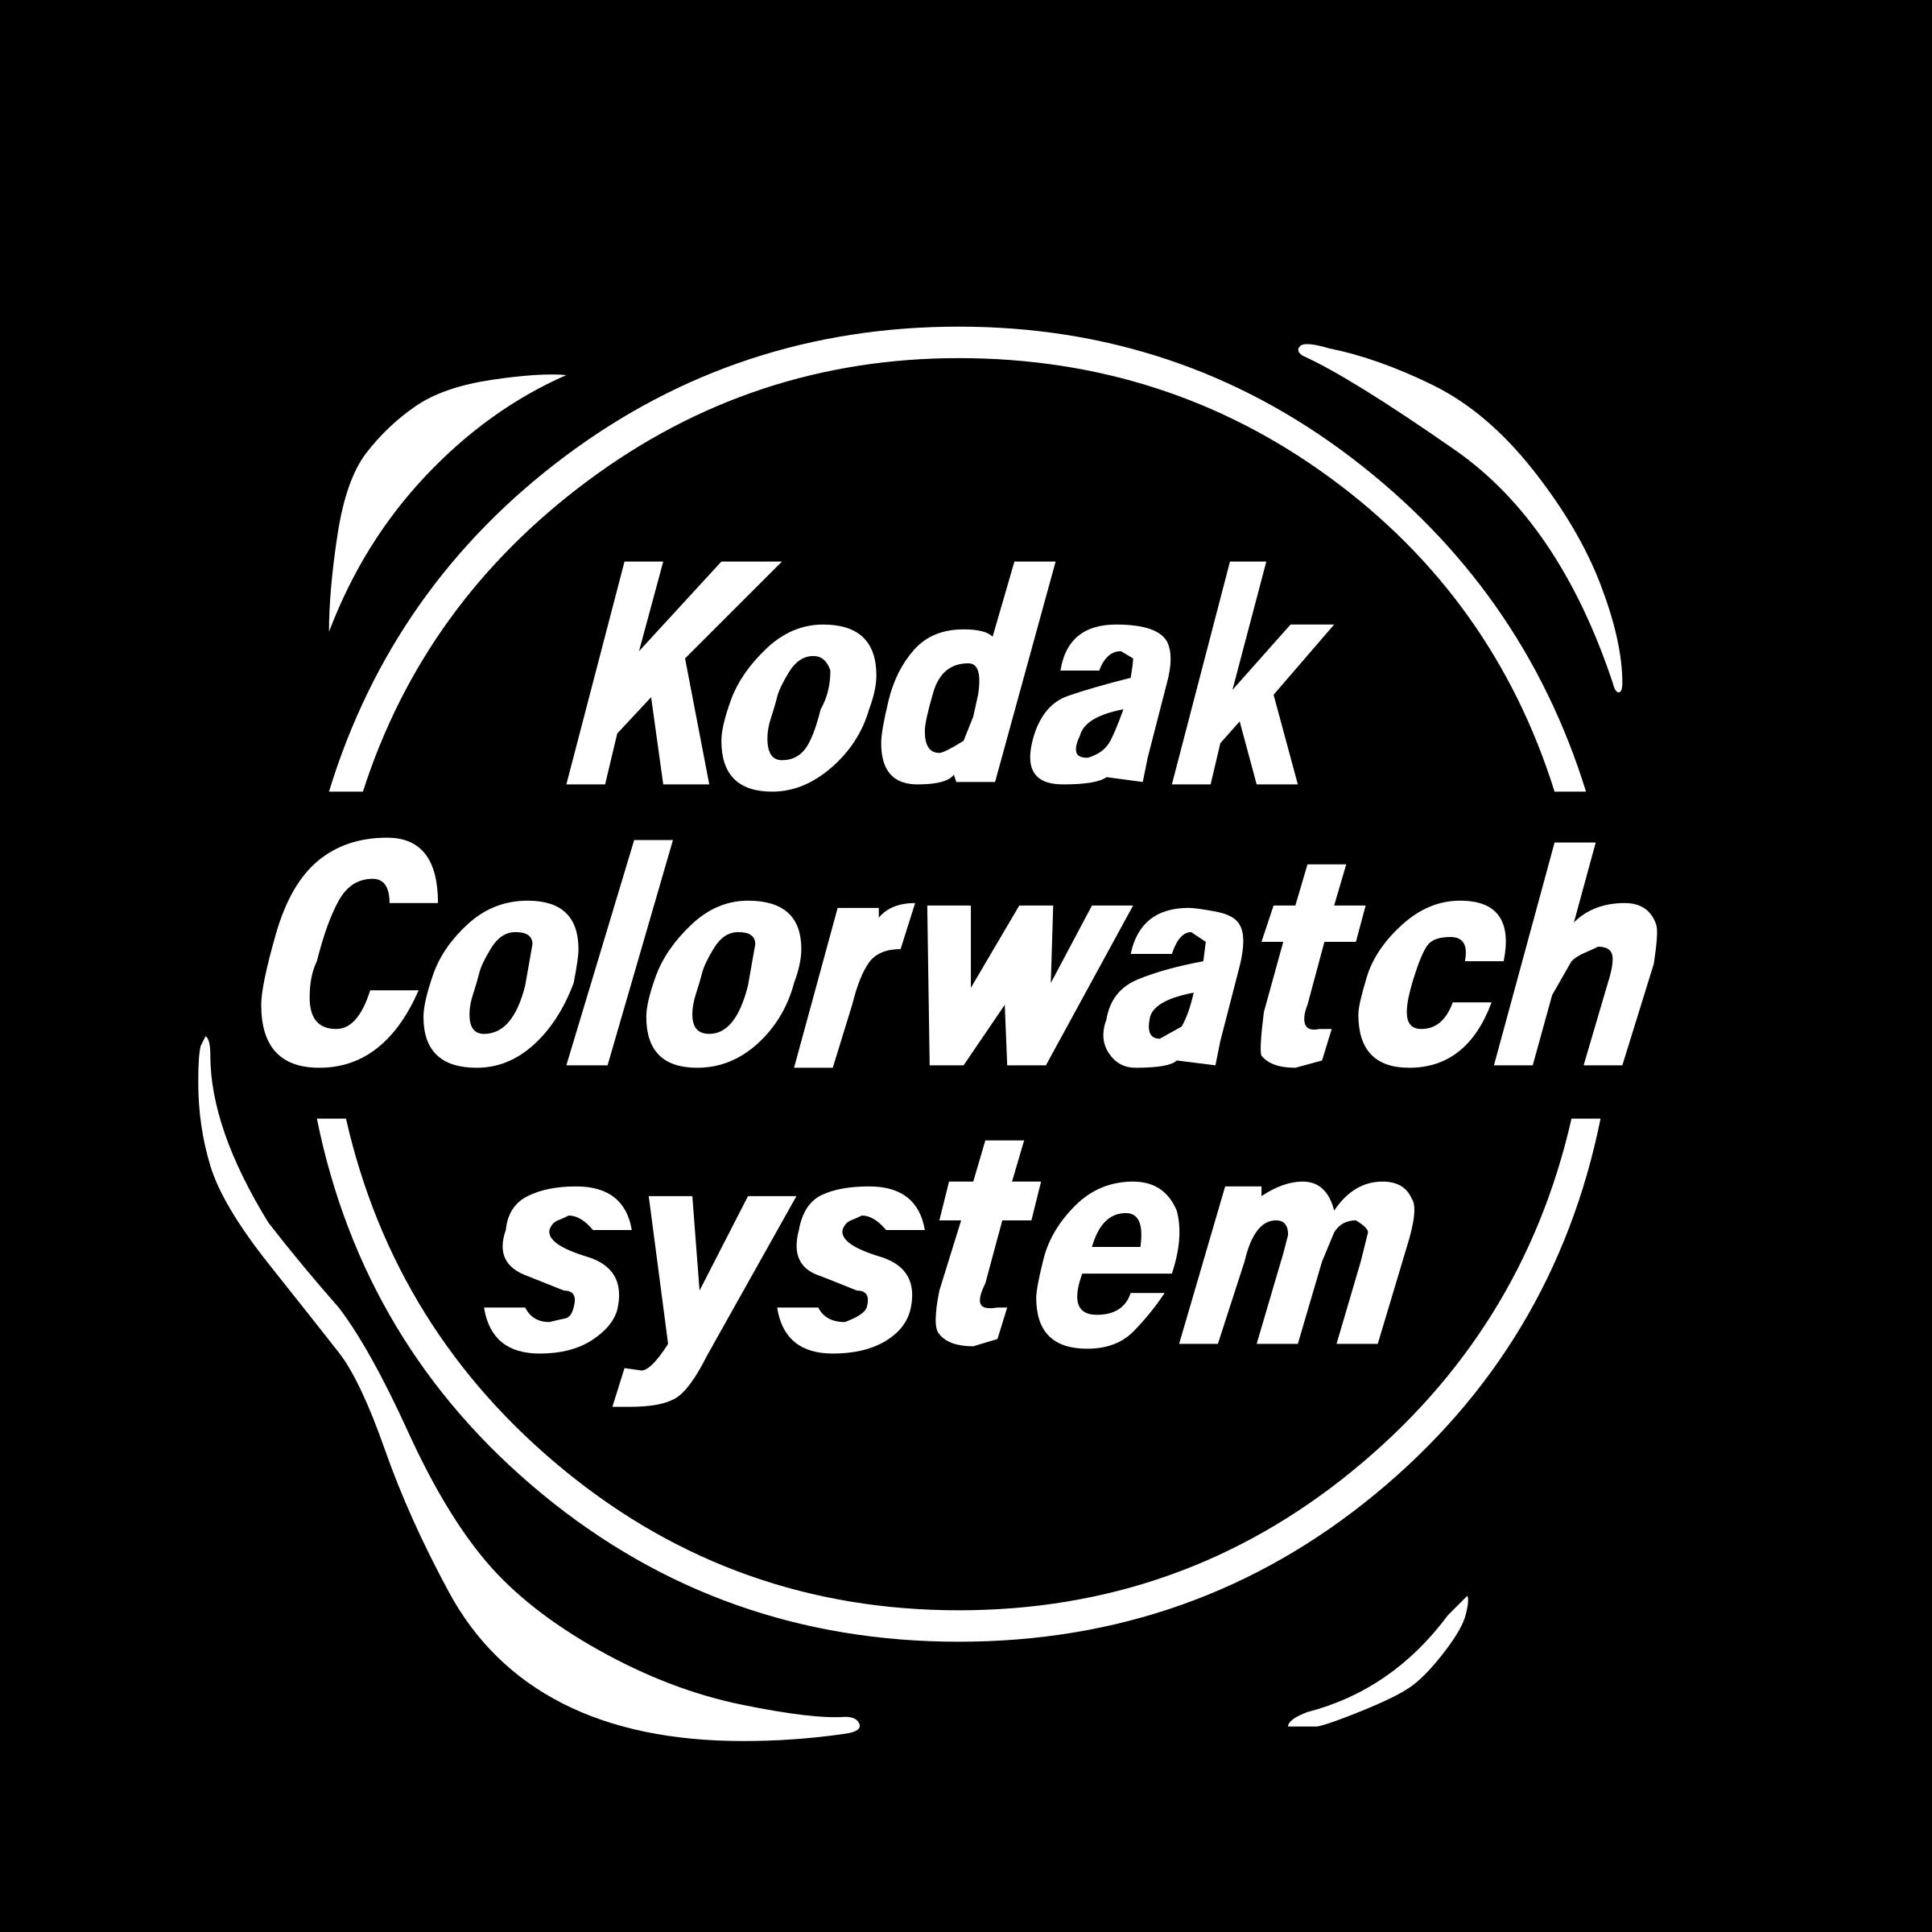 Kodak Logo PNG Transparent & SVG Vector - Freebie Supply  Kodak Logo PNG ...